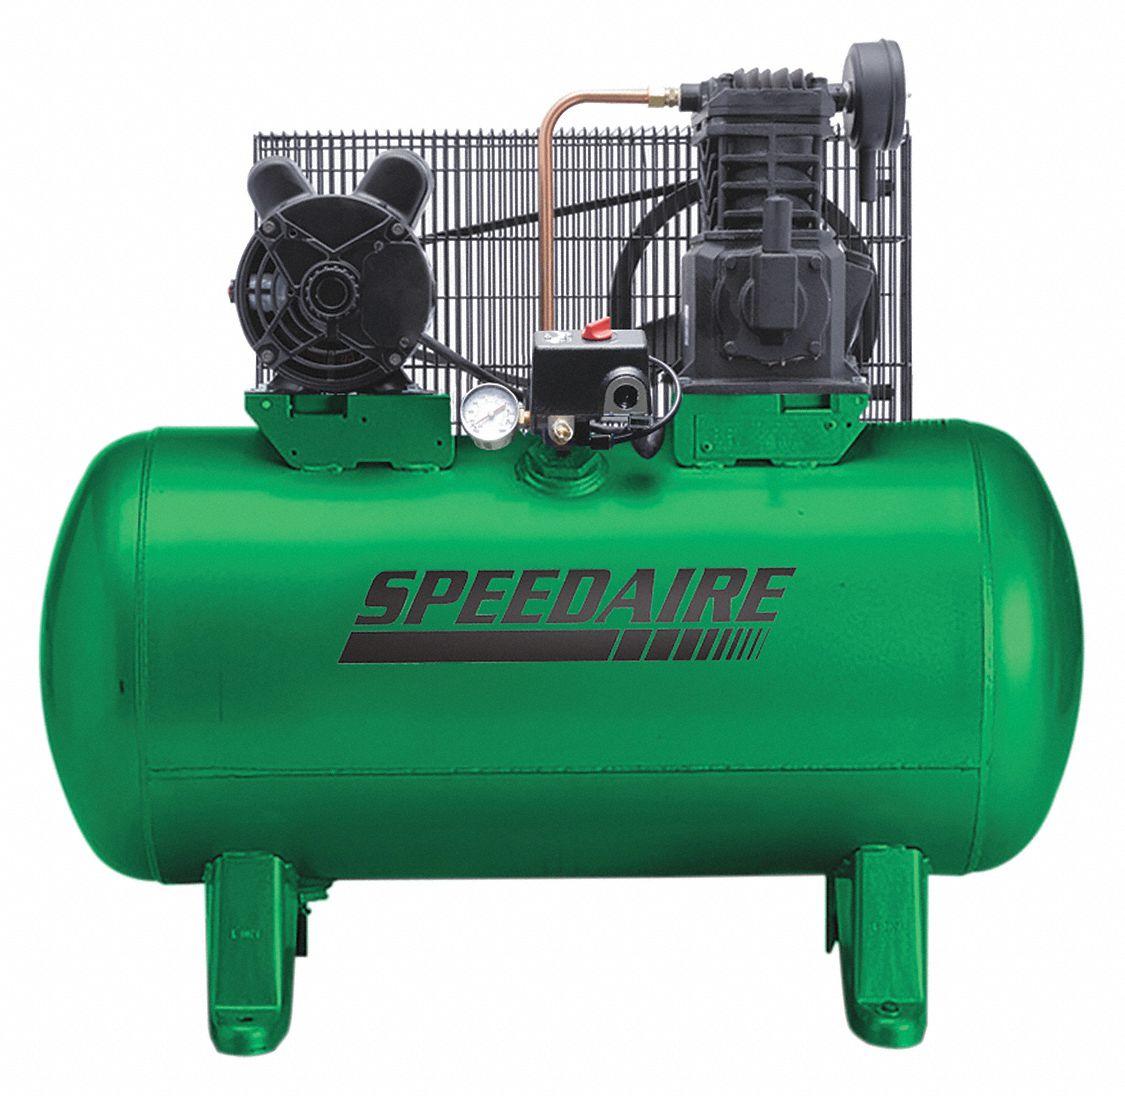 SPEEDAIRE 1 Phase - Electrical Horizontal Tank Mounted 2.0 hpHP - Air  Compressor Stationary Air Compressor, 30 - 4B234|4B234 - GraingerGrainger